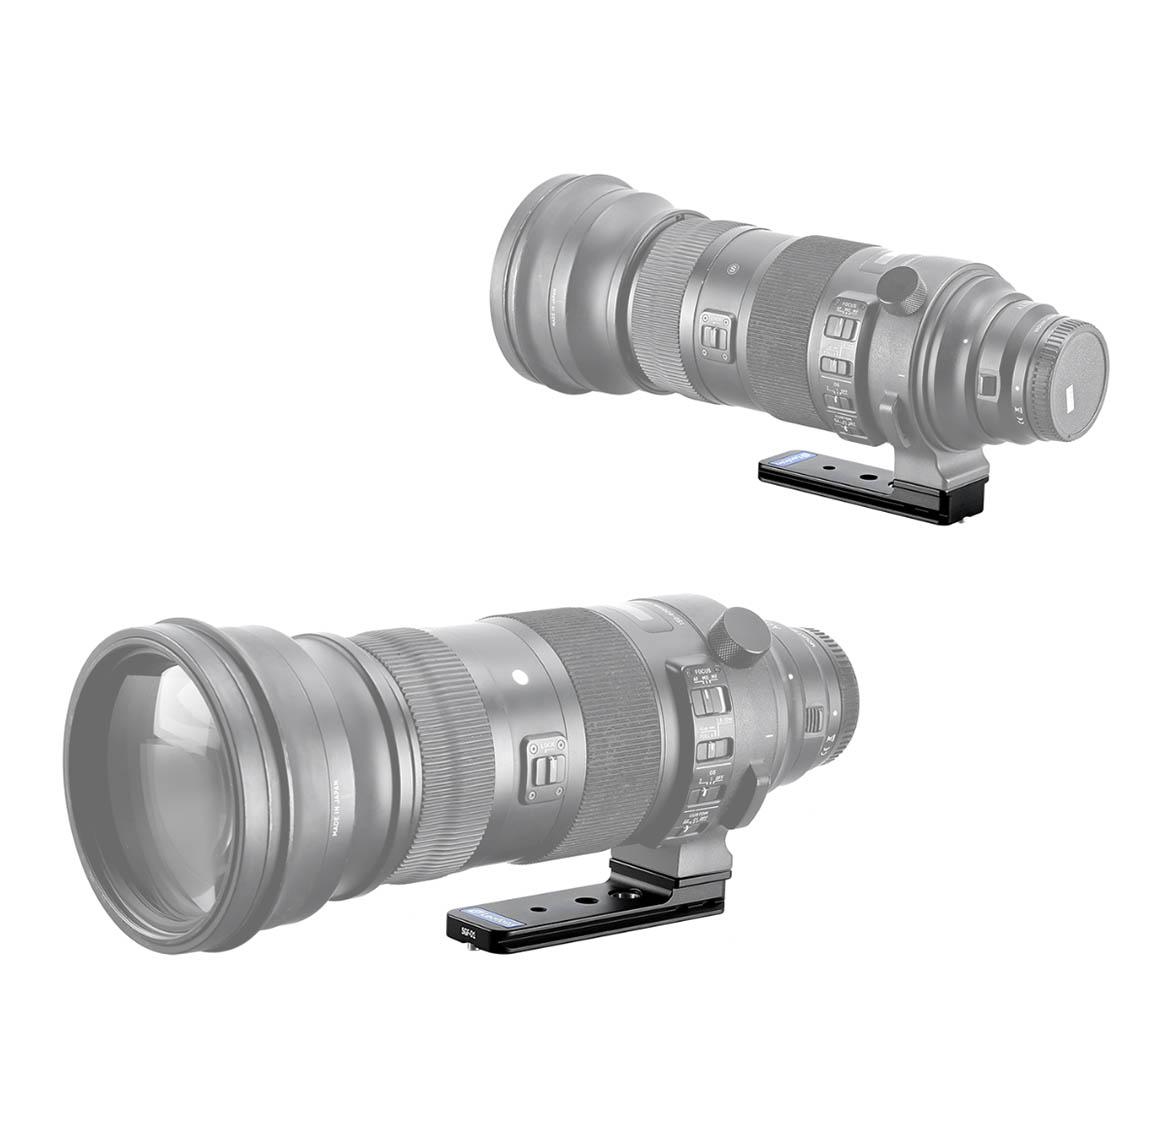 Leofoto SFG-01 para teleobjetivo zoom Simga 150-600